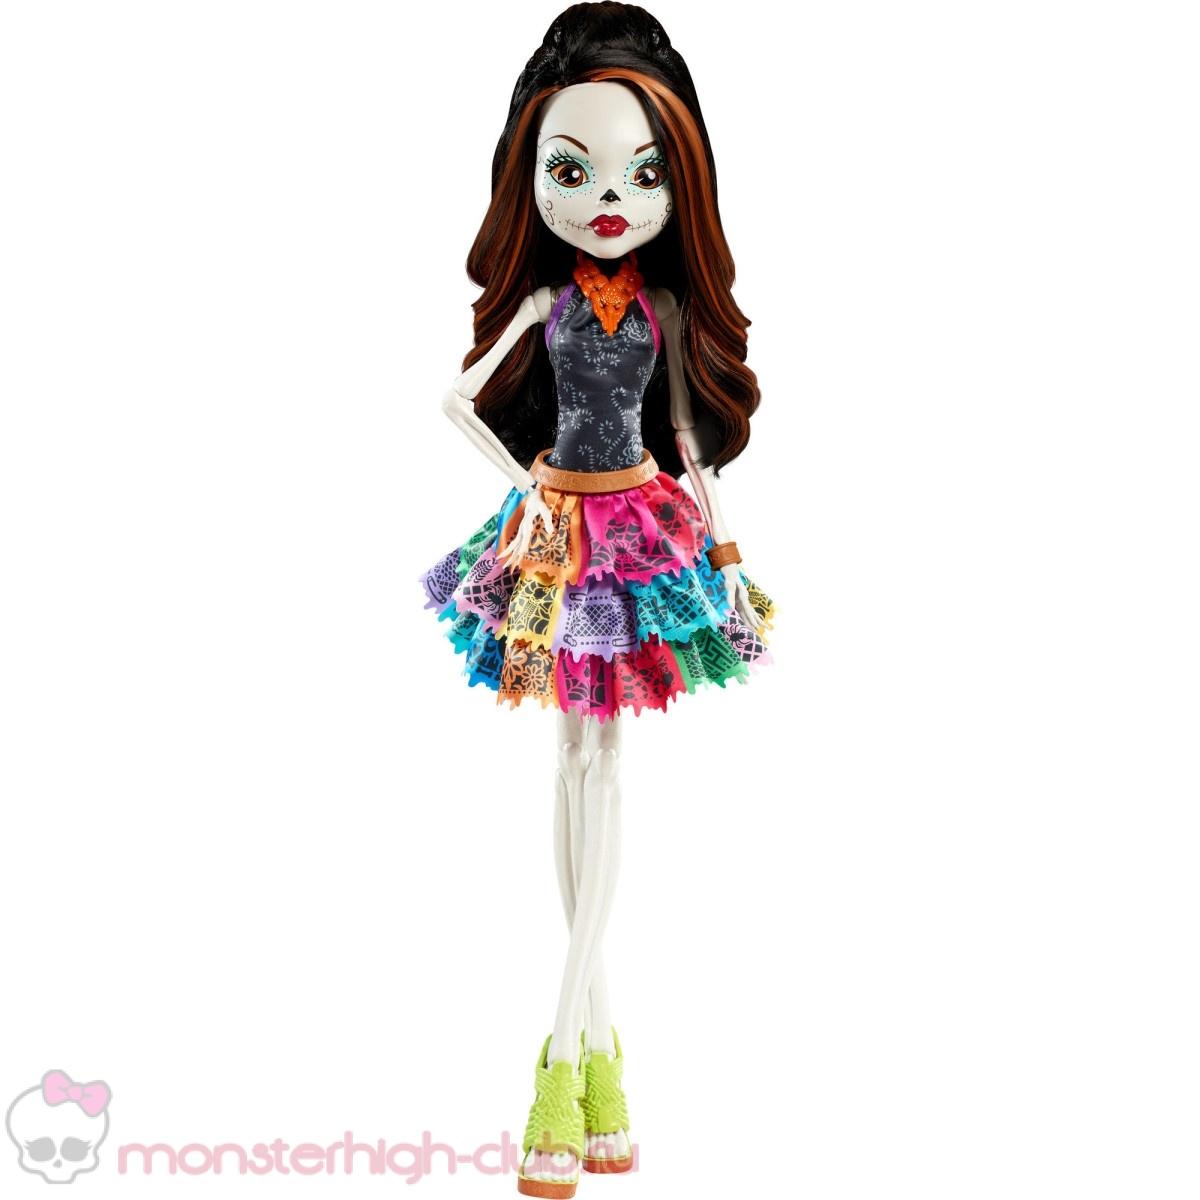 monster_high_skelita_calaveras_giant_70_cm_doll_beast_freaky_friend (1)